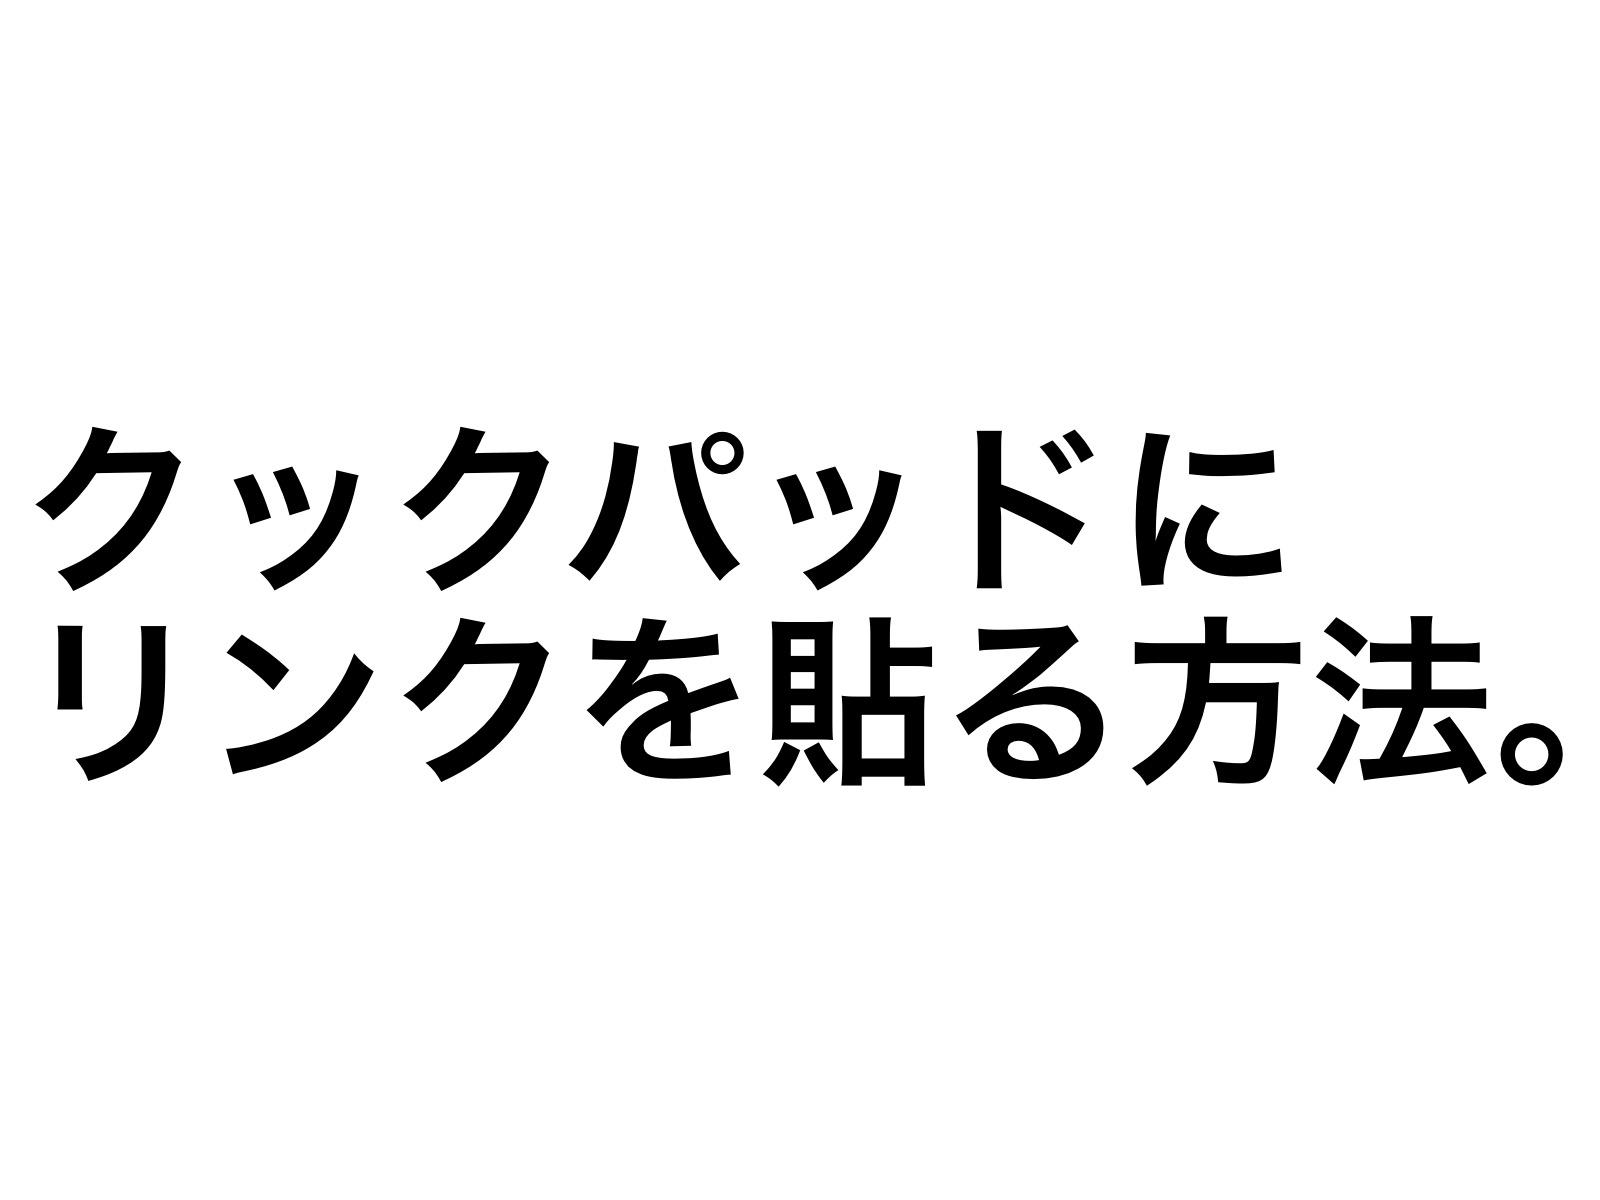 2017 03 15 15 10 04